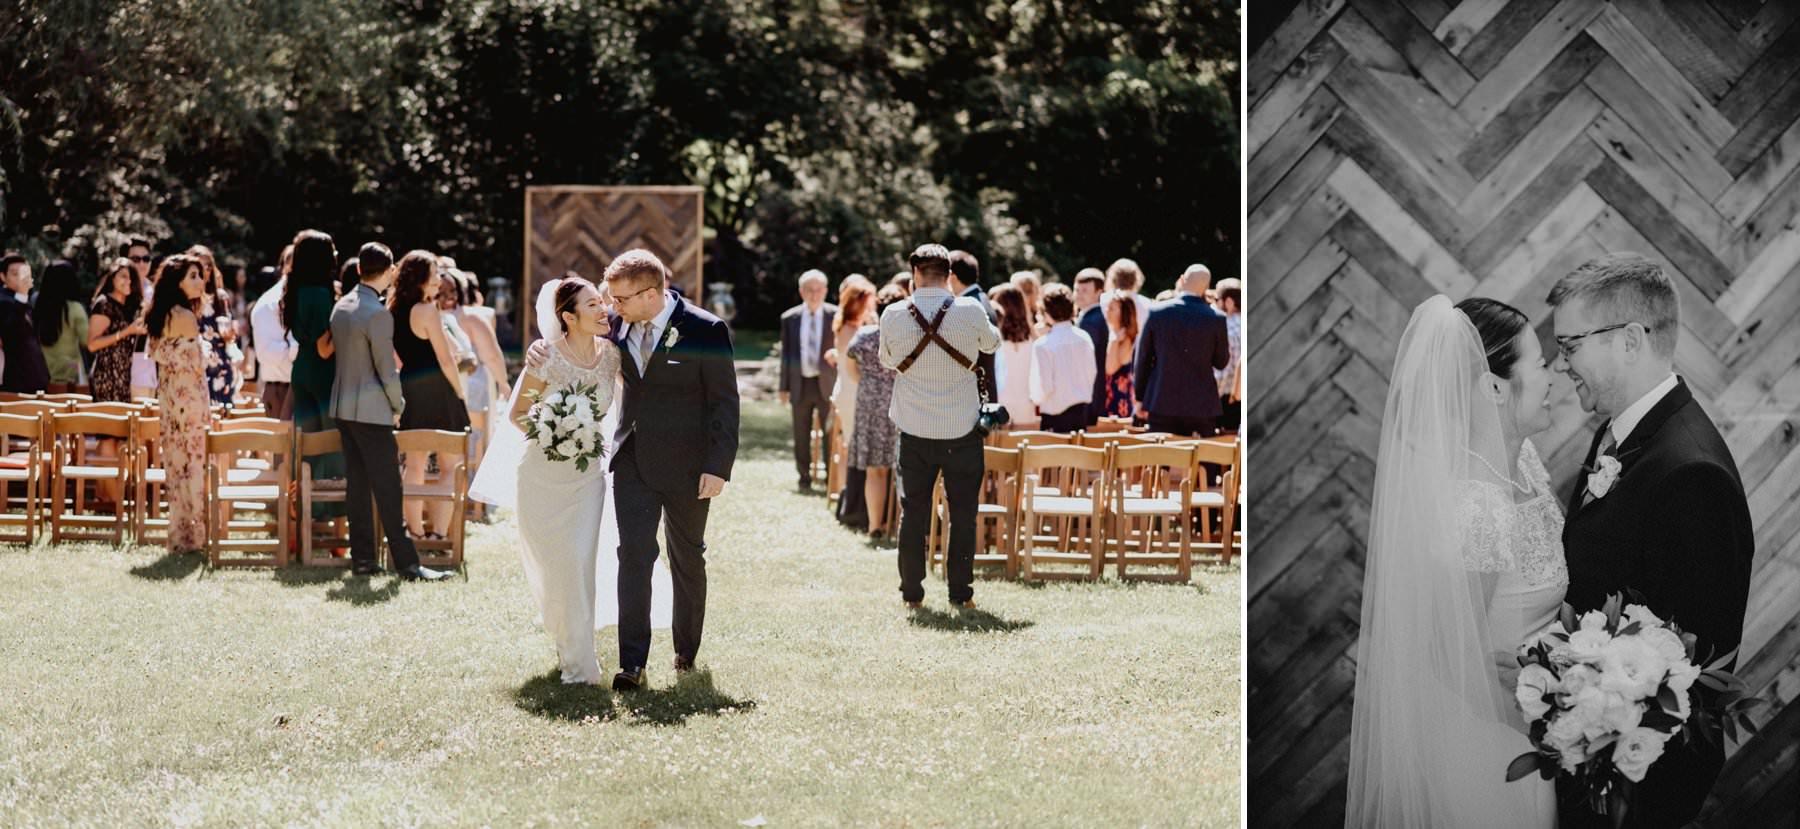 Appleford-estate-wedding-93.jpg